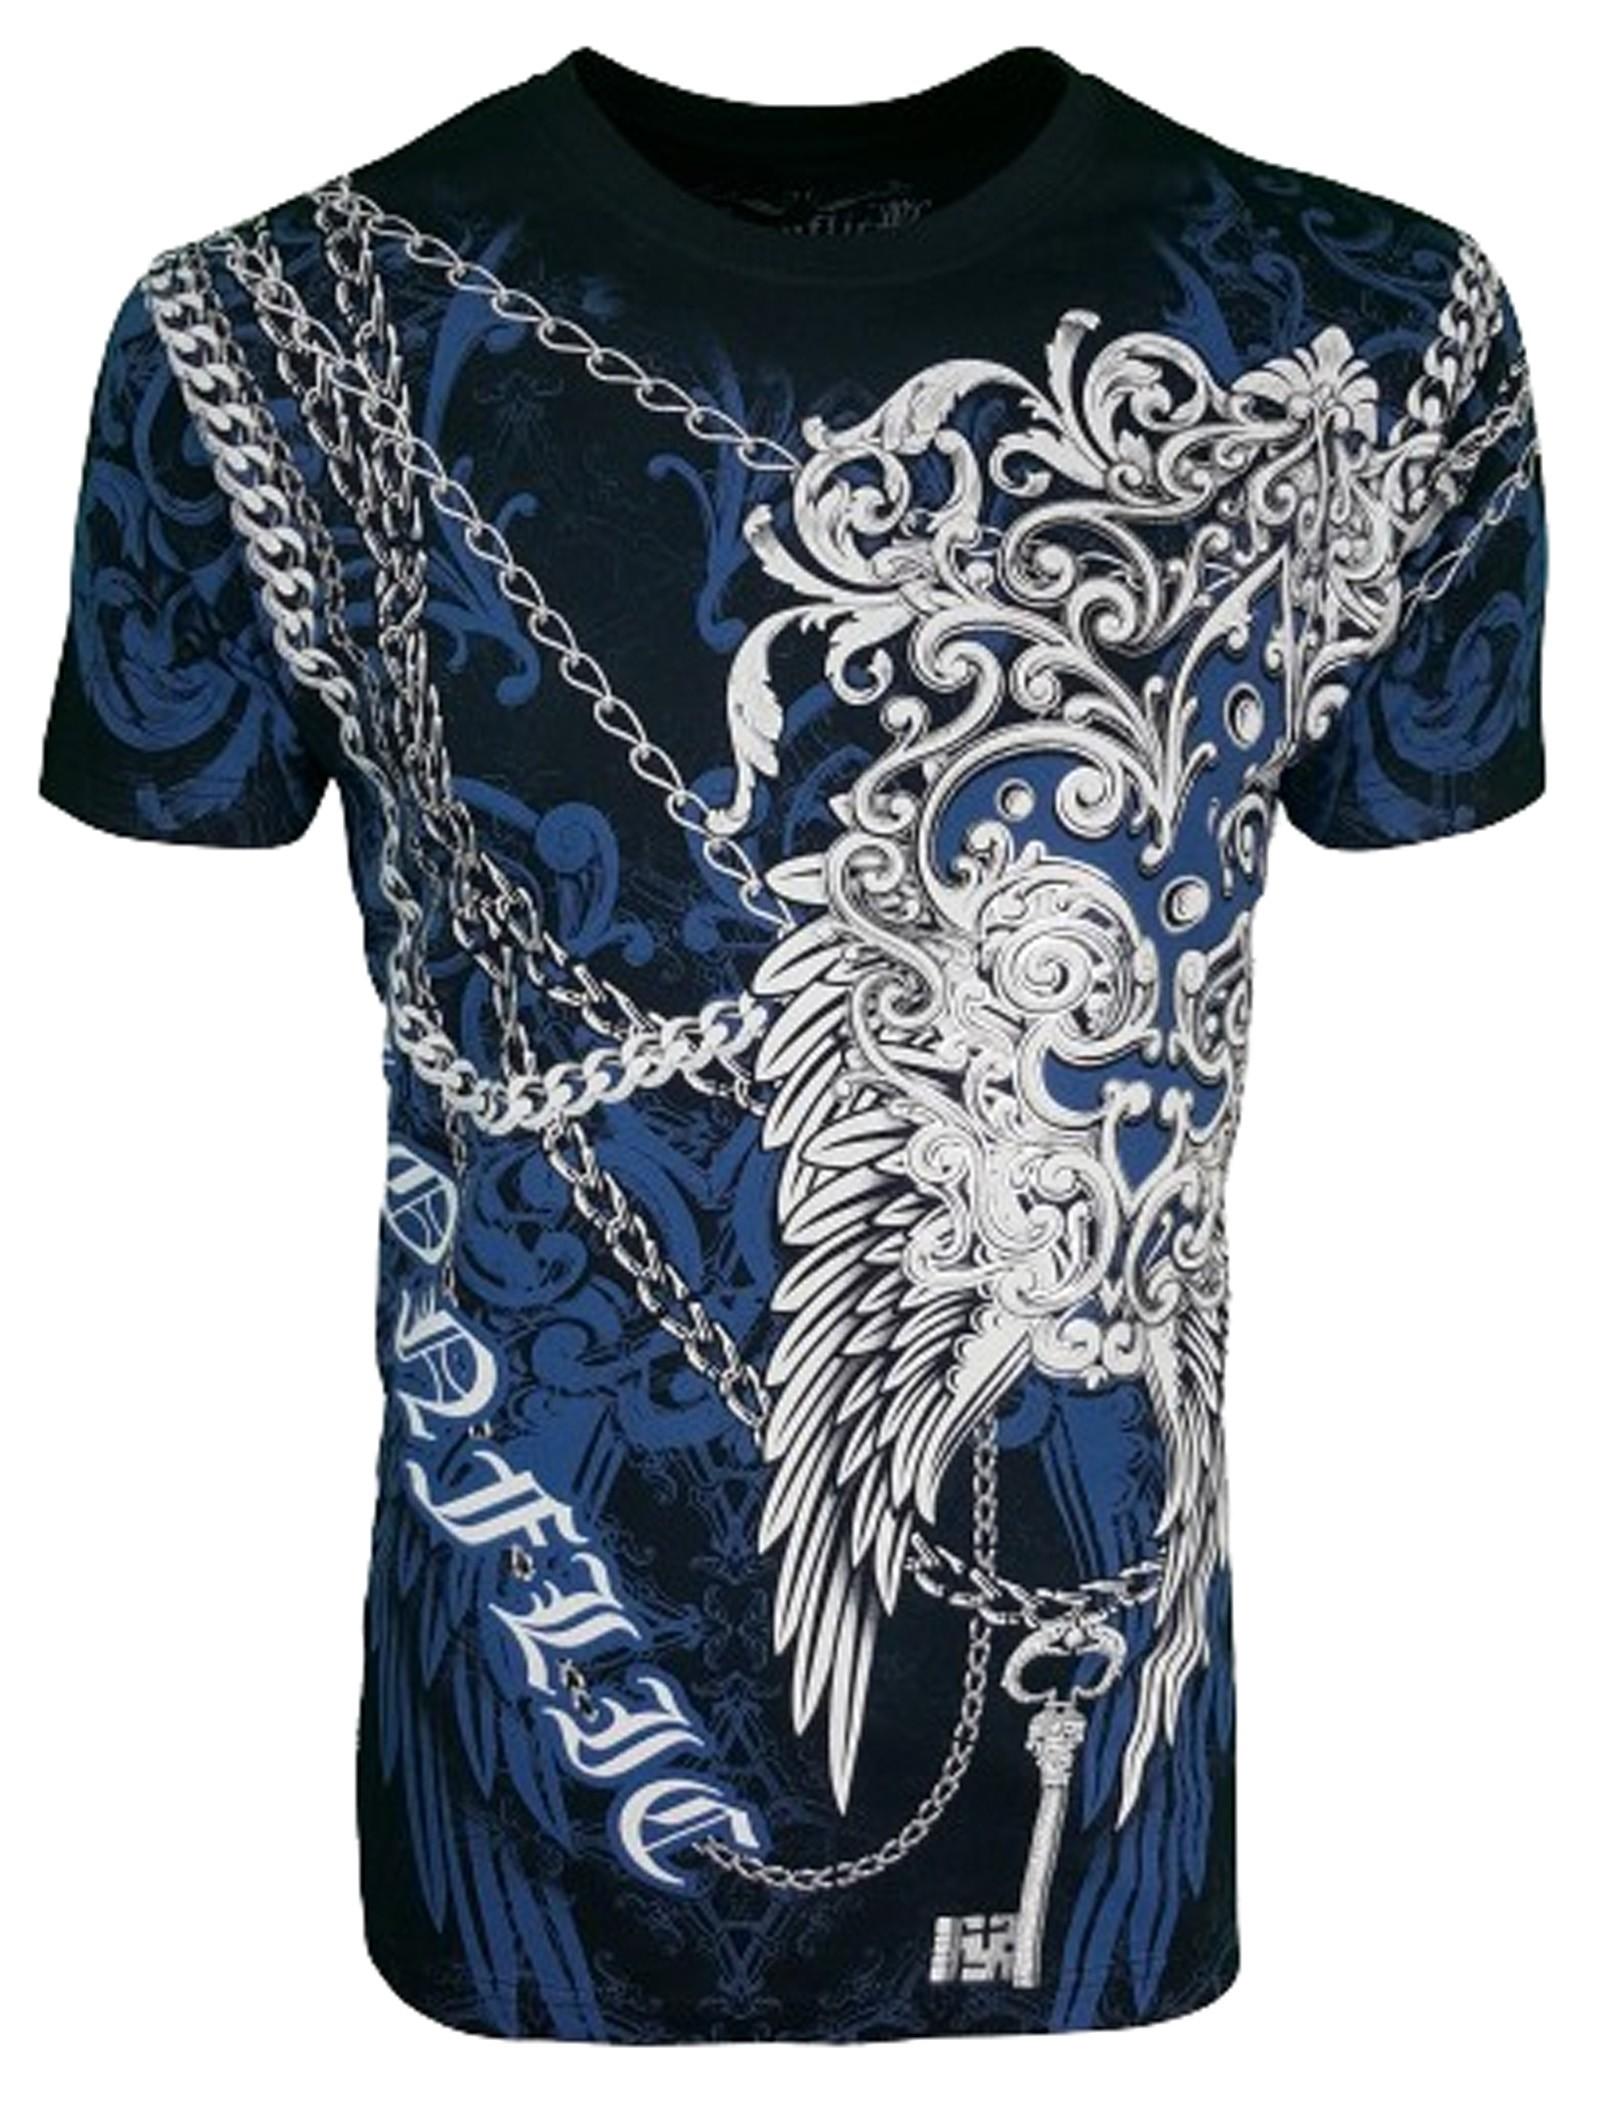 Konflic Clothing - Starlite Chains T-Shirt